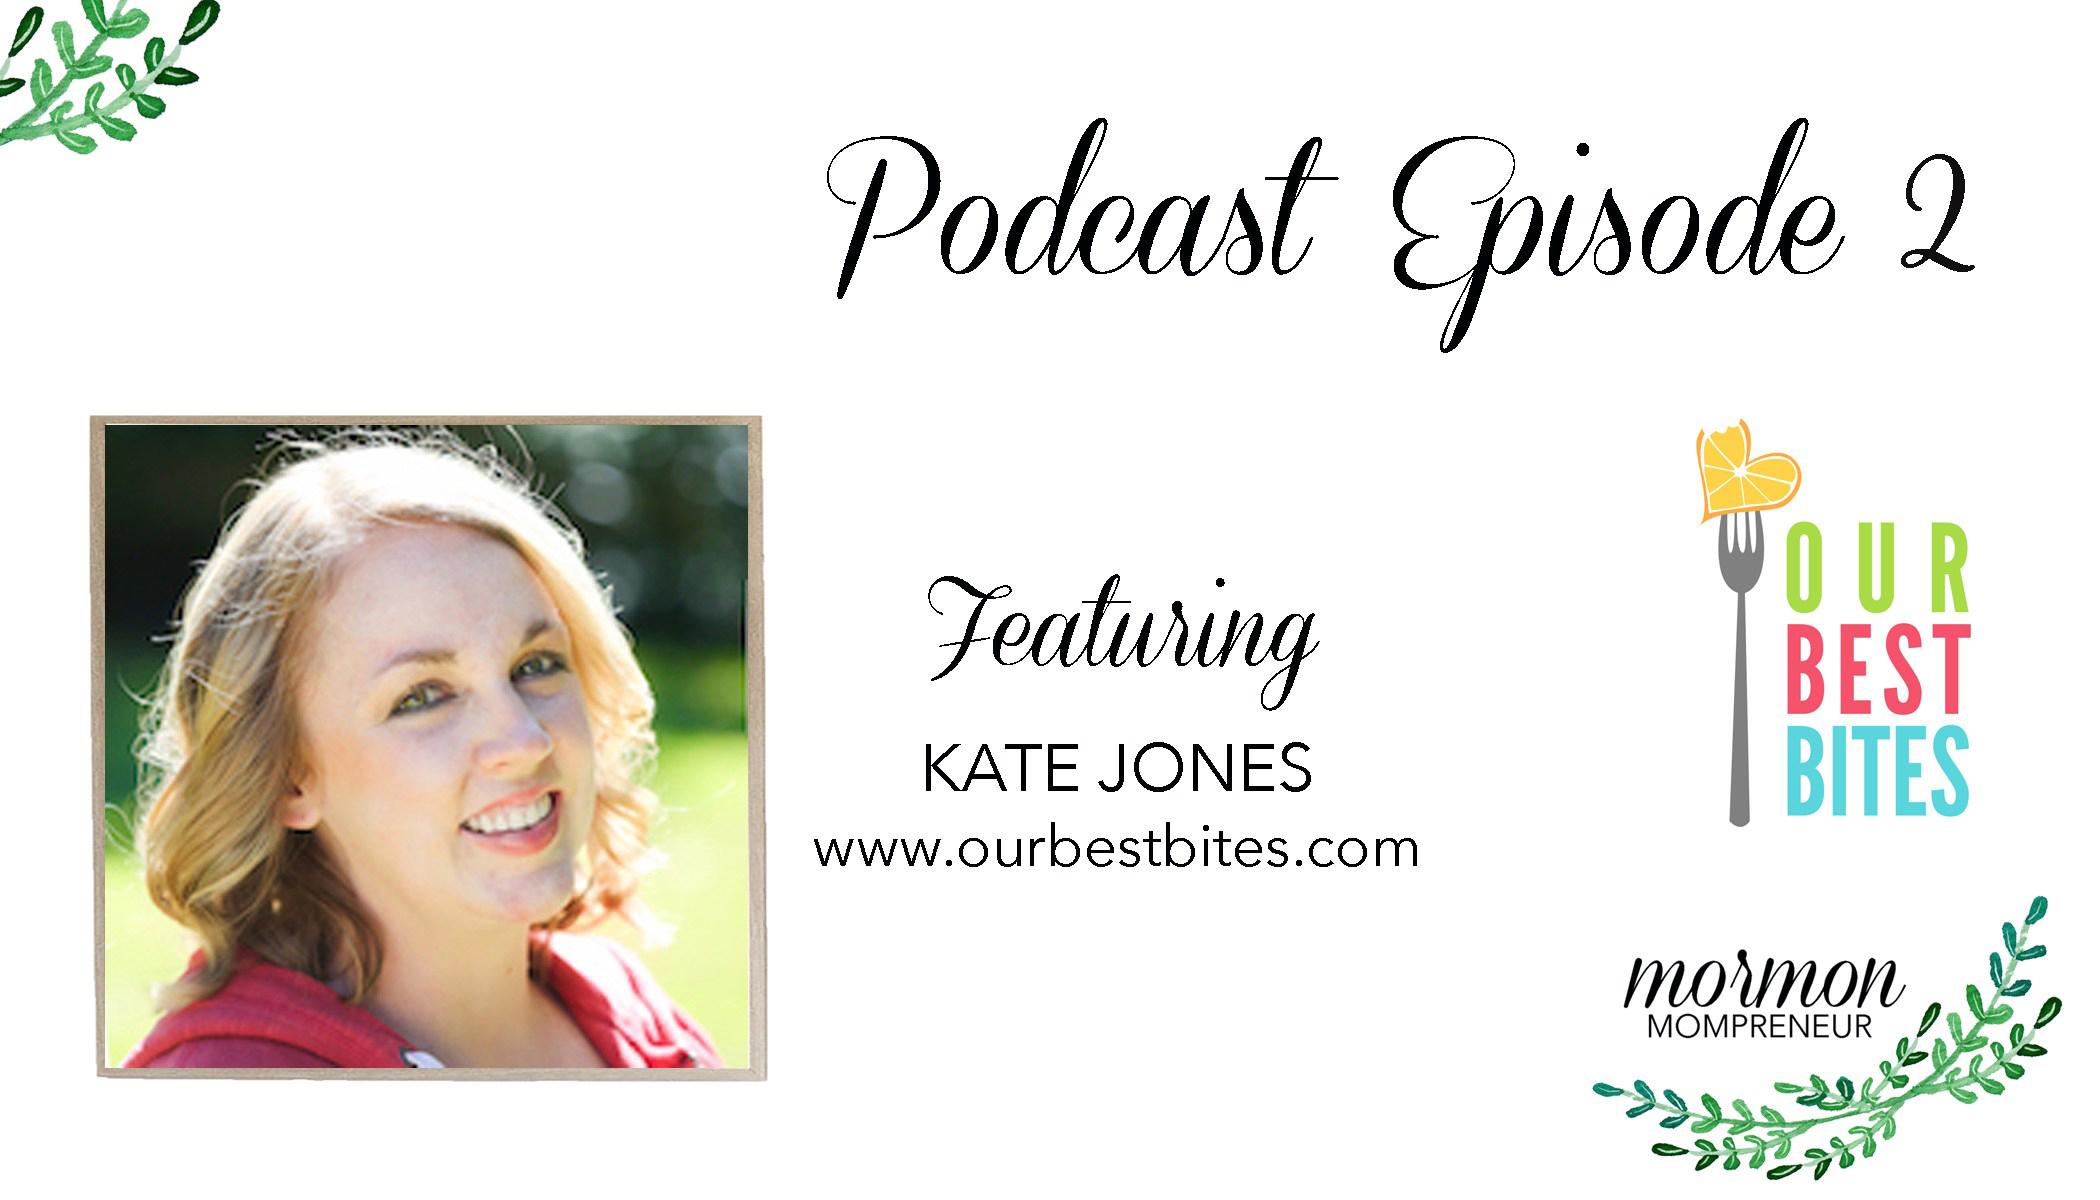 mormon mompreneur podcast episode 2 Kate Jones Our Best Bites